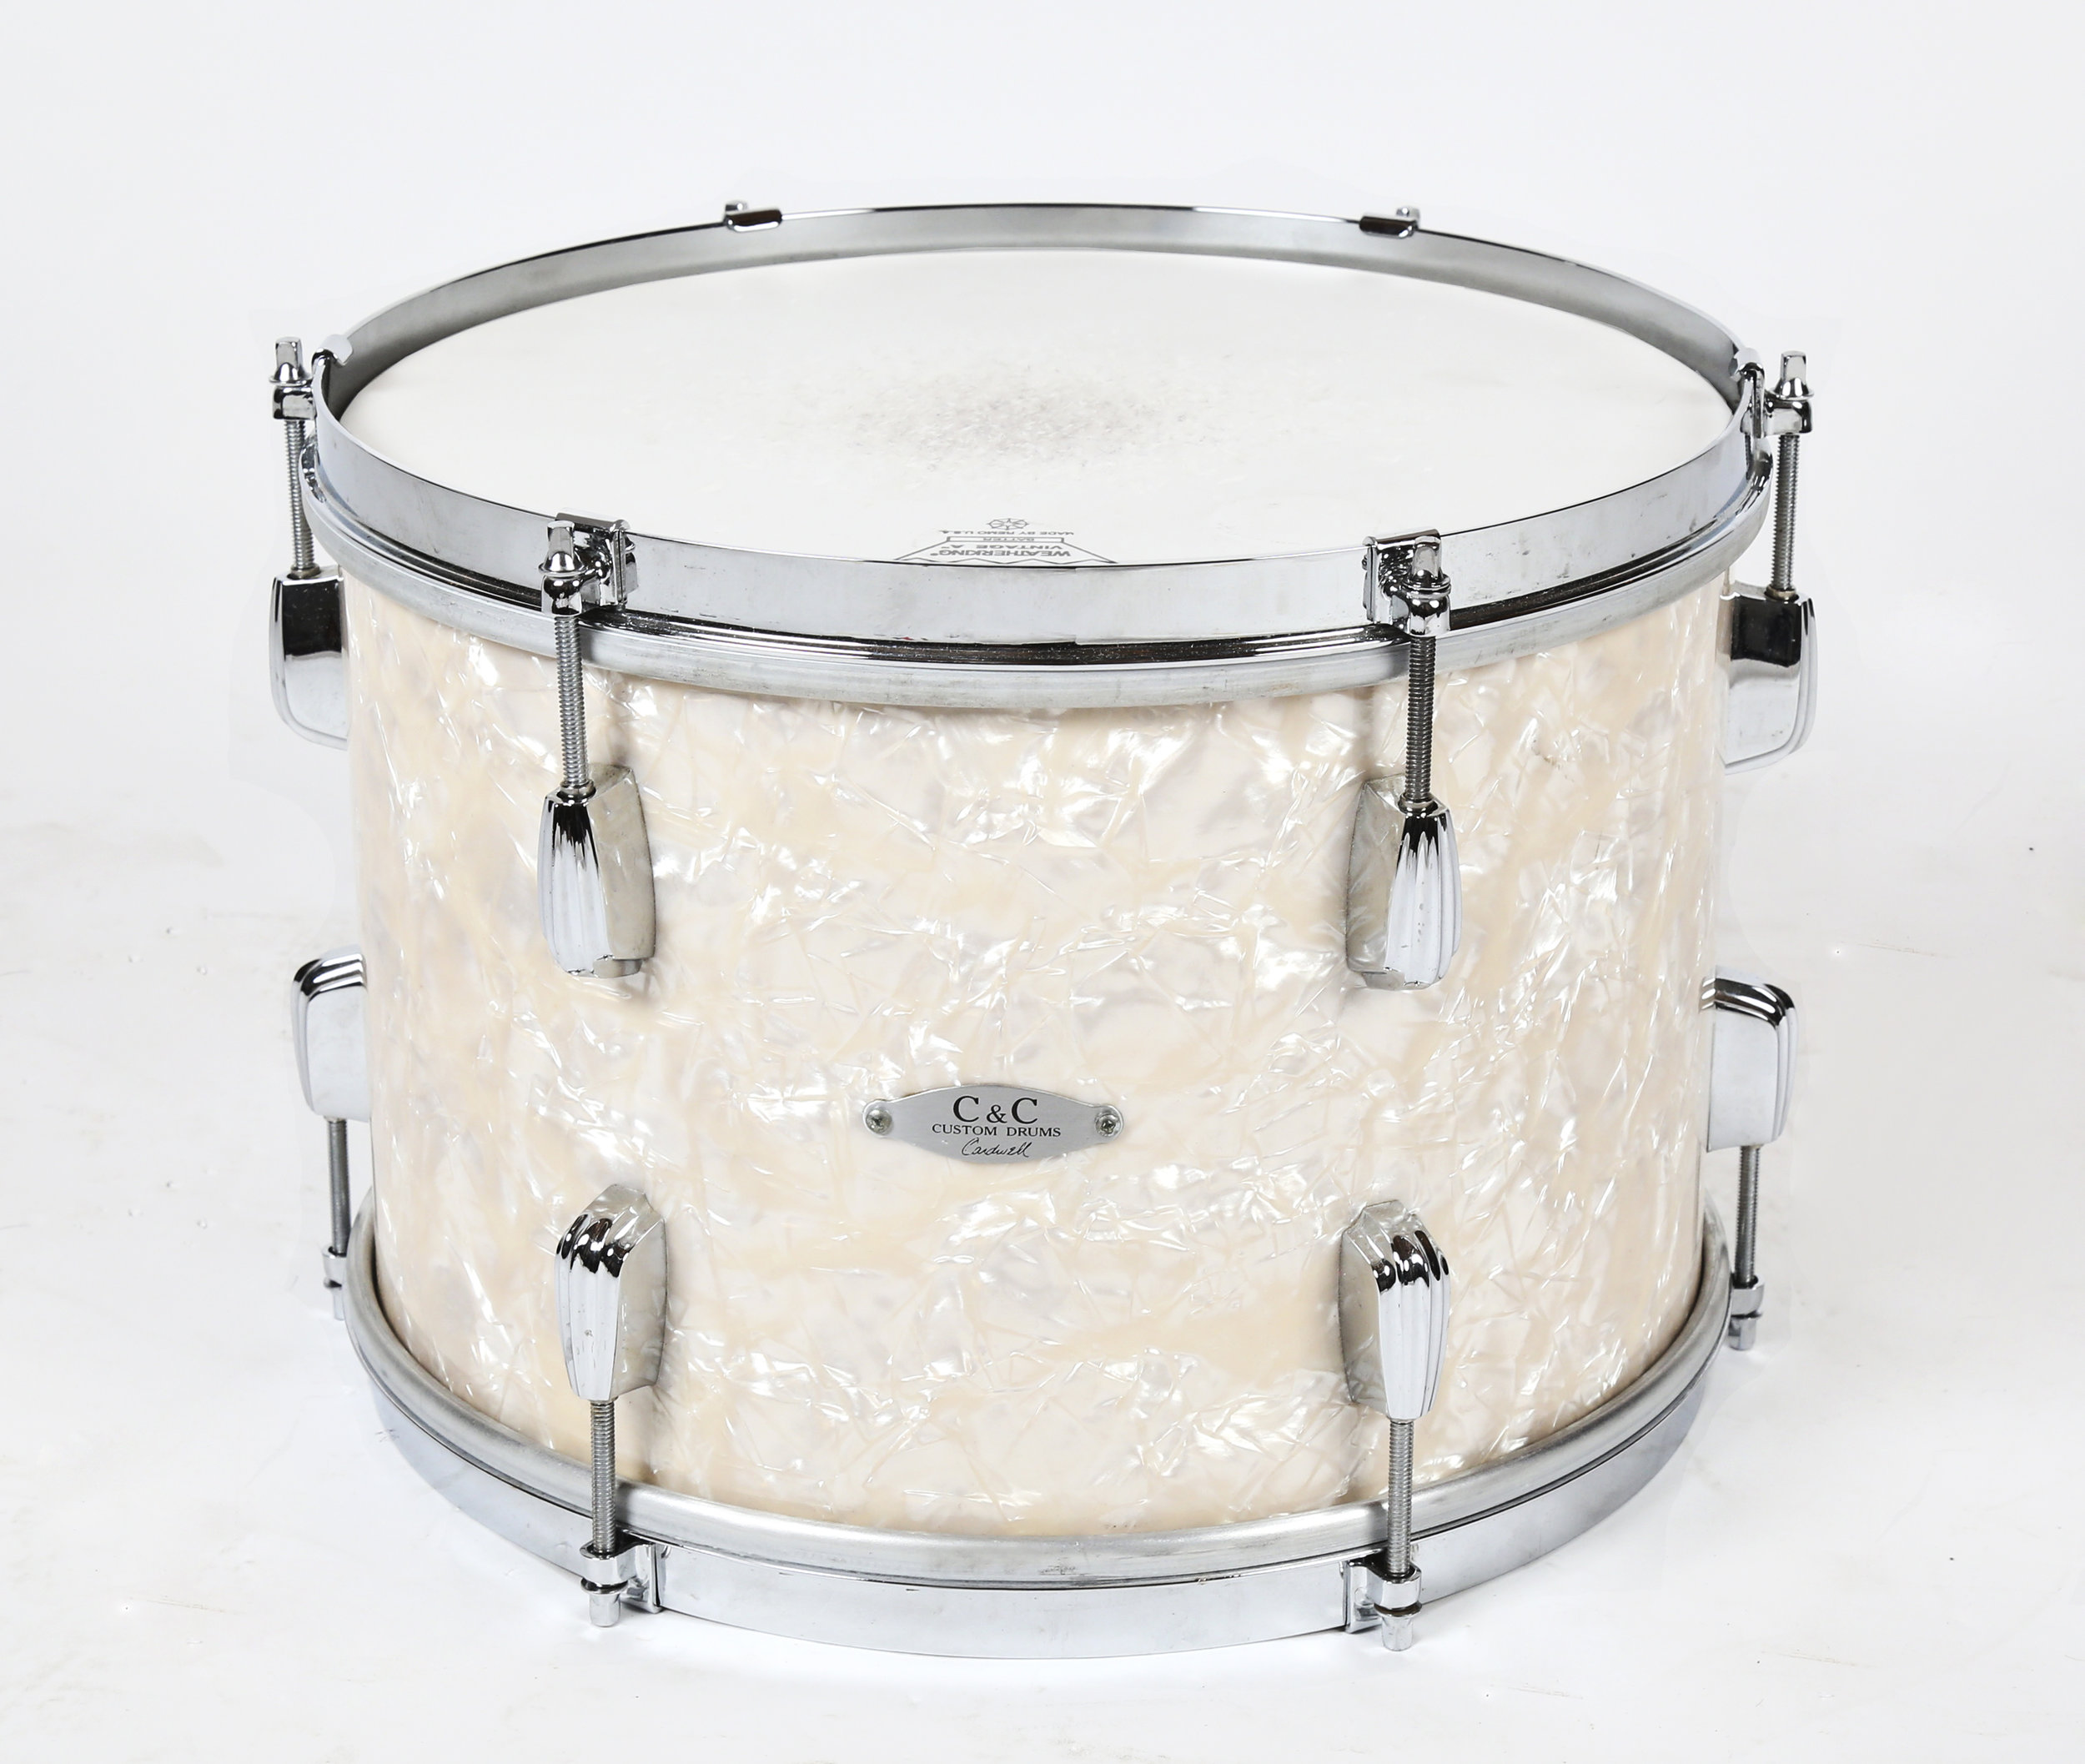 Dorio Vintage Drum_C&C Big Red_1925.jpg